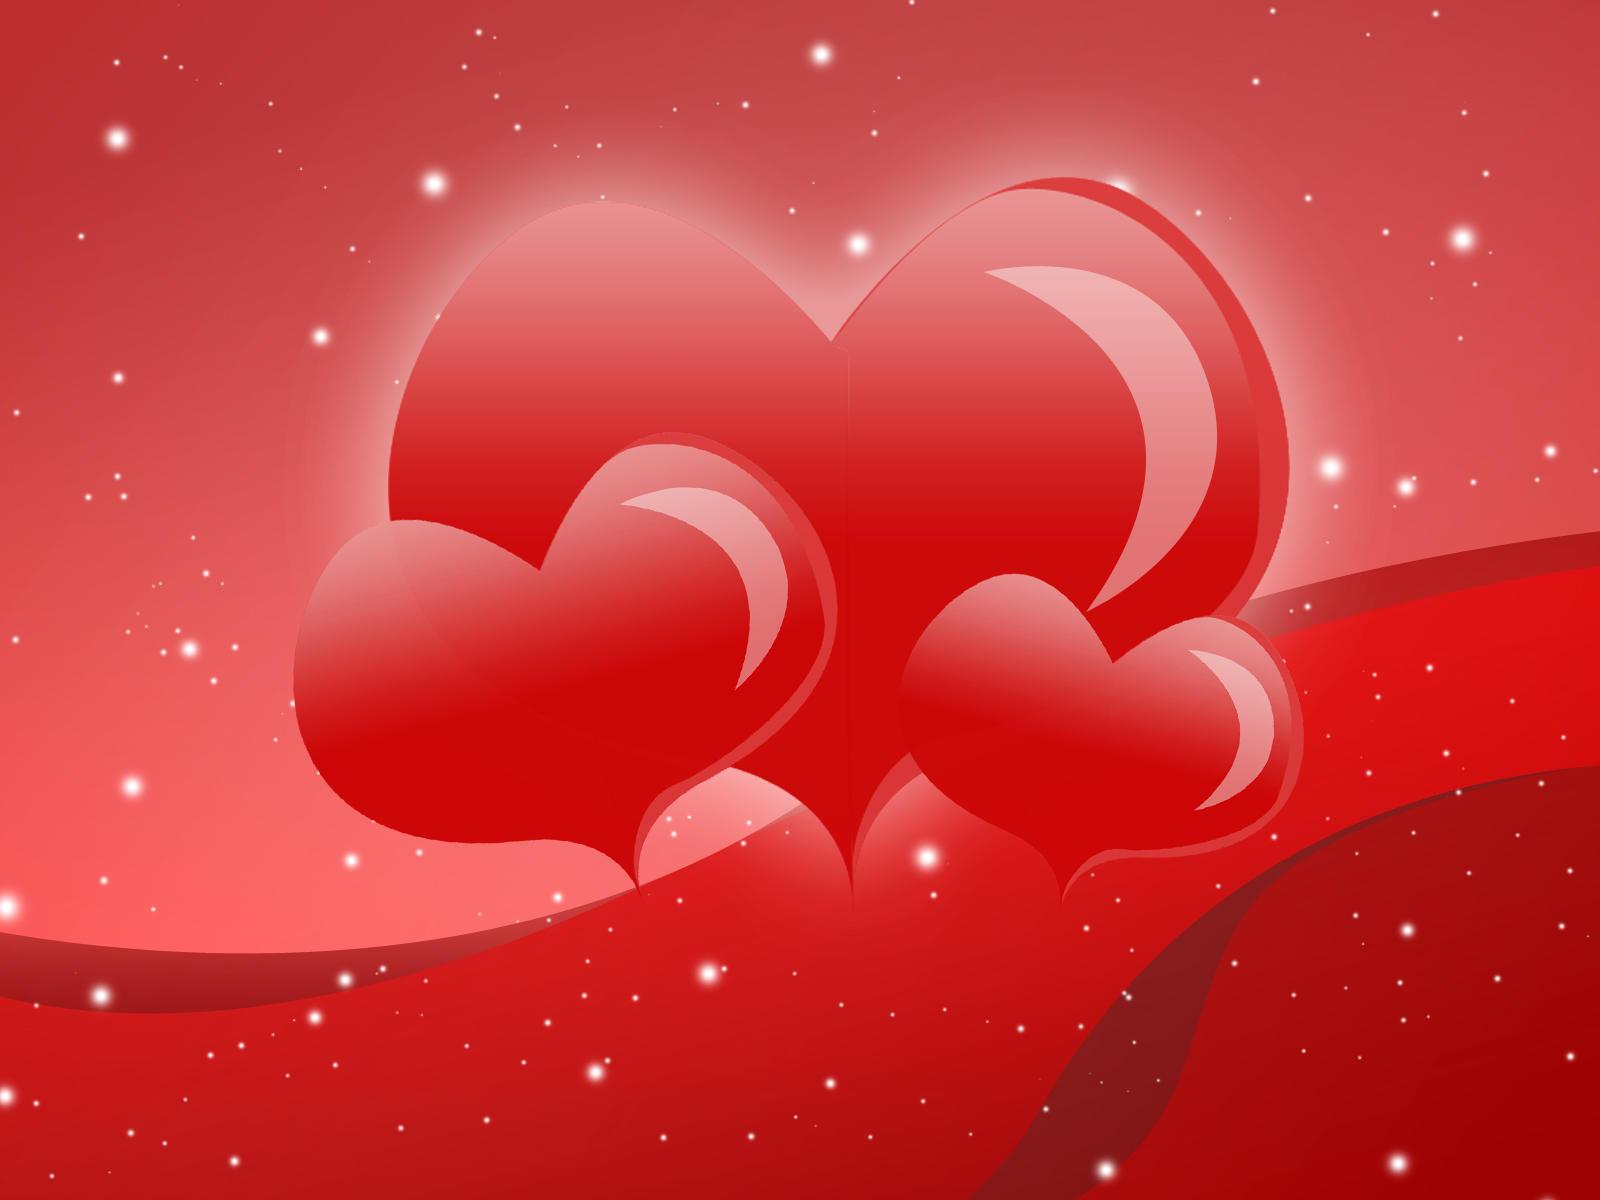 valentines wallpaper by techthenoob on deviantart